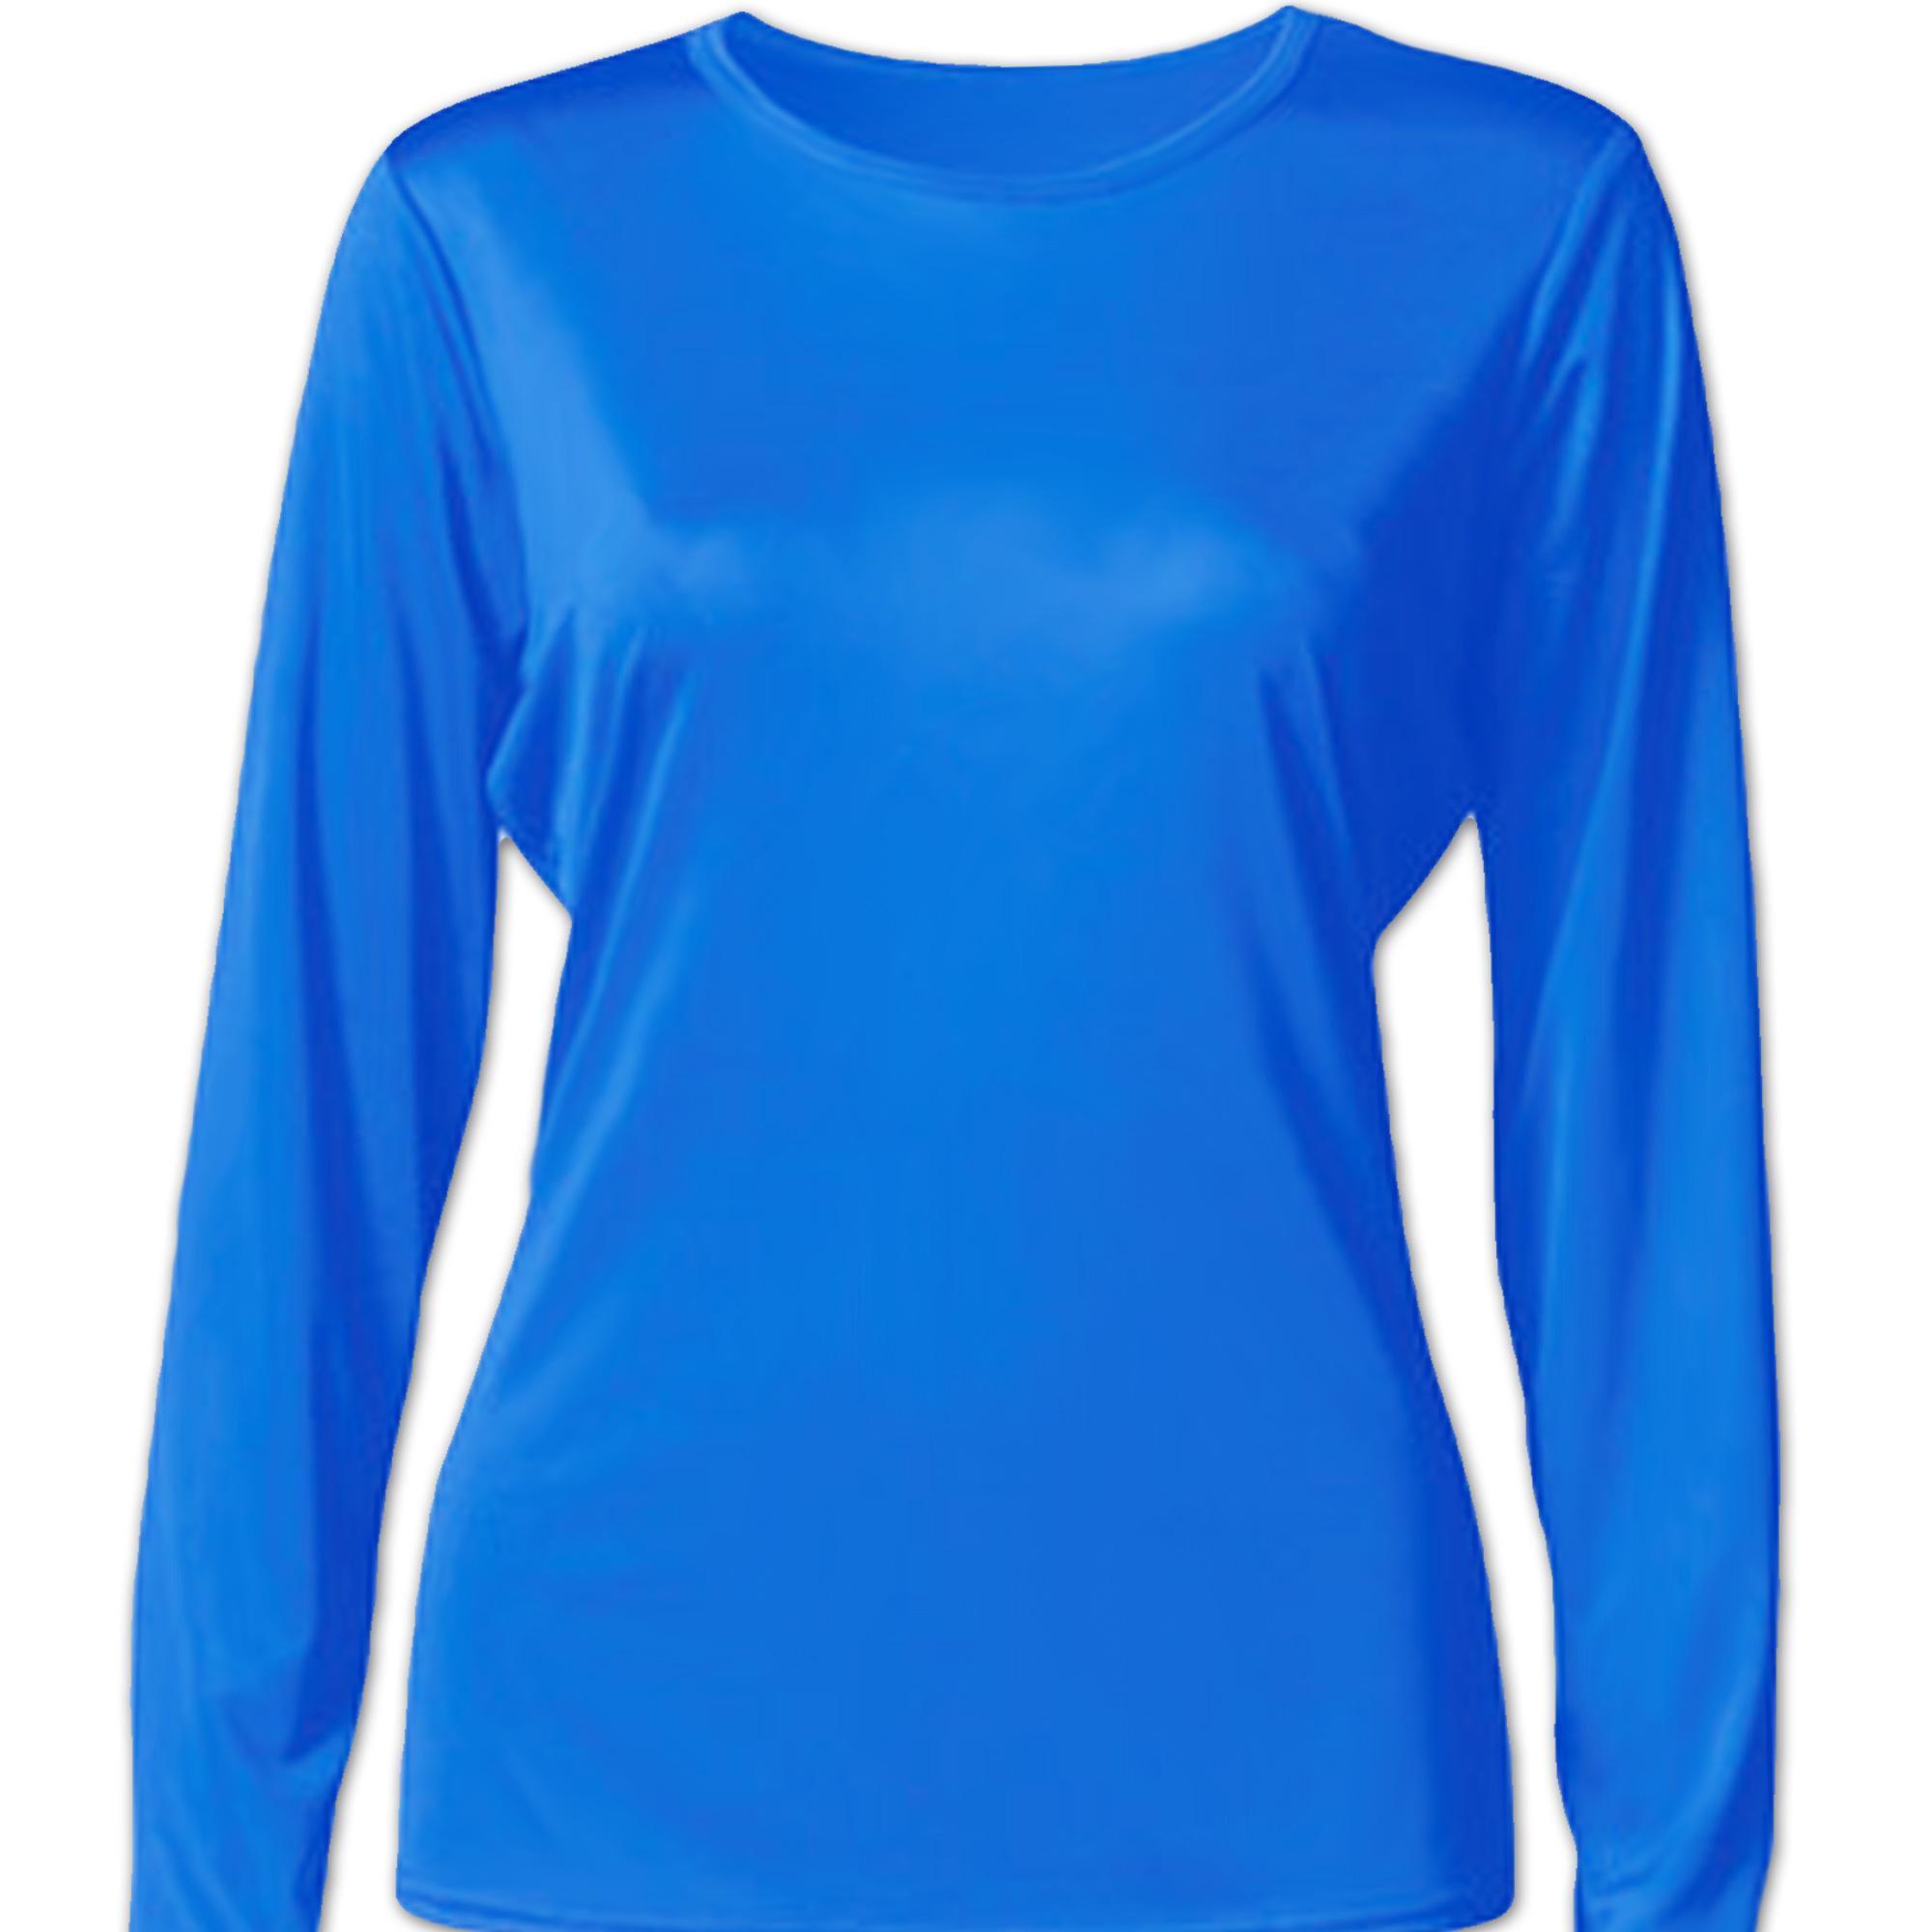 d3cdf505 Bradley Women's Casual Fit Long Sleeve Rash Guard Swim Shirt with UV ...